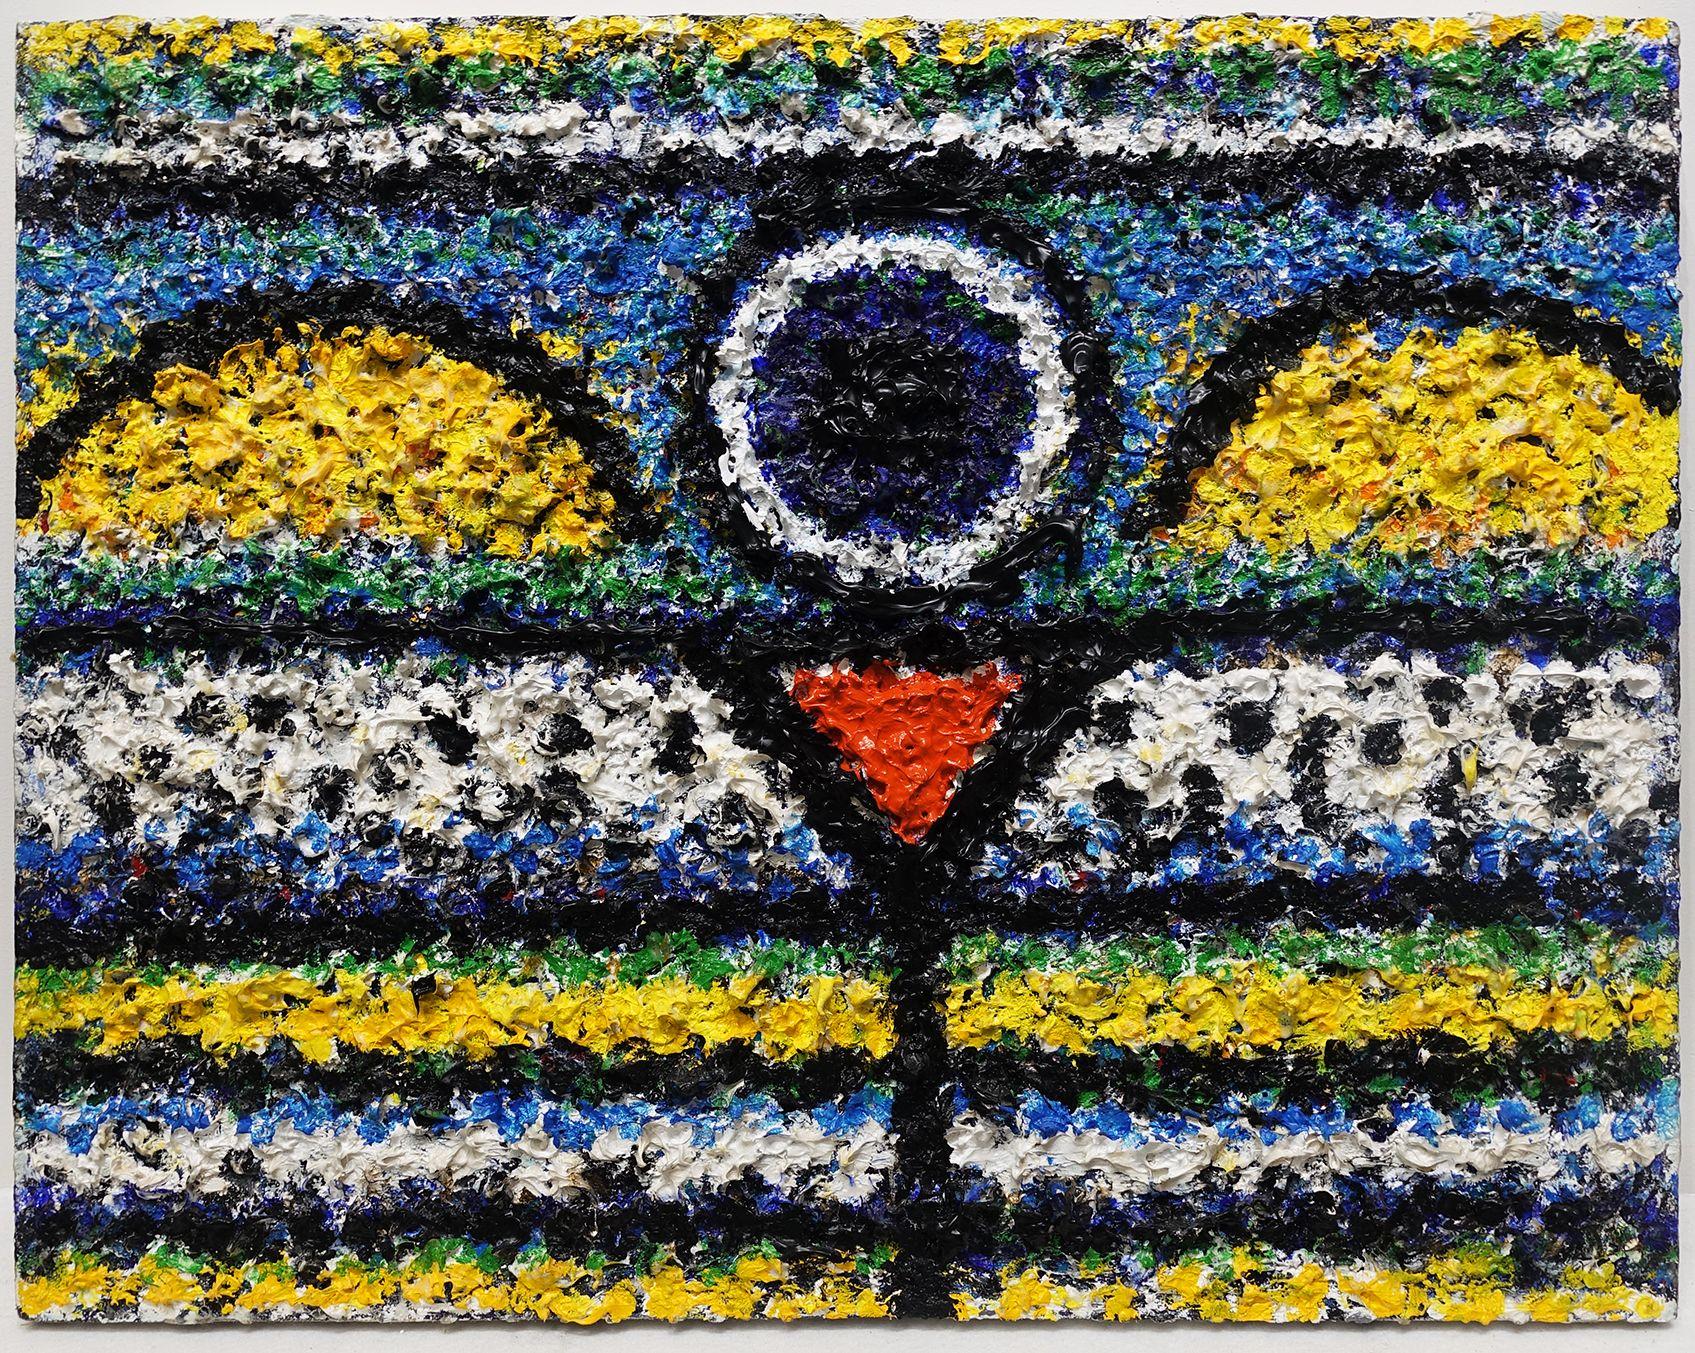 Richard Pousette-Dart (1916-1992) Opaque Horizon, 1985–6